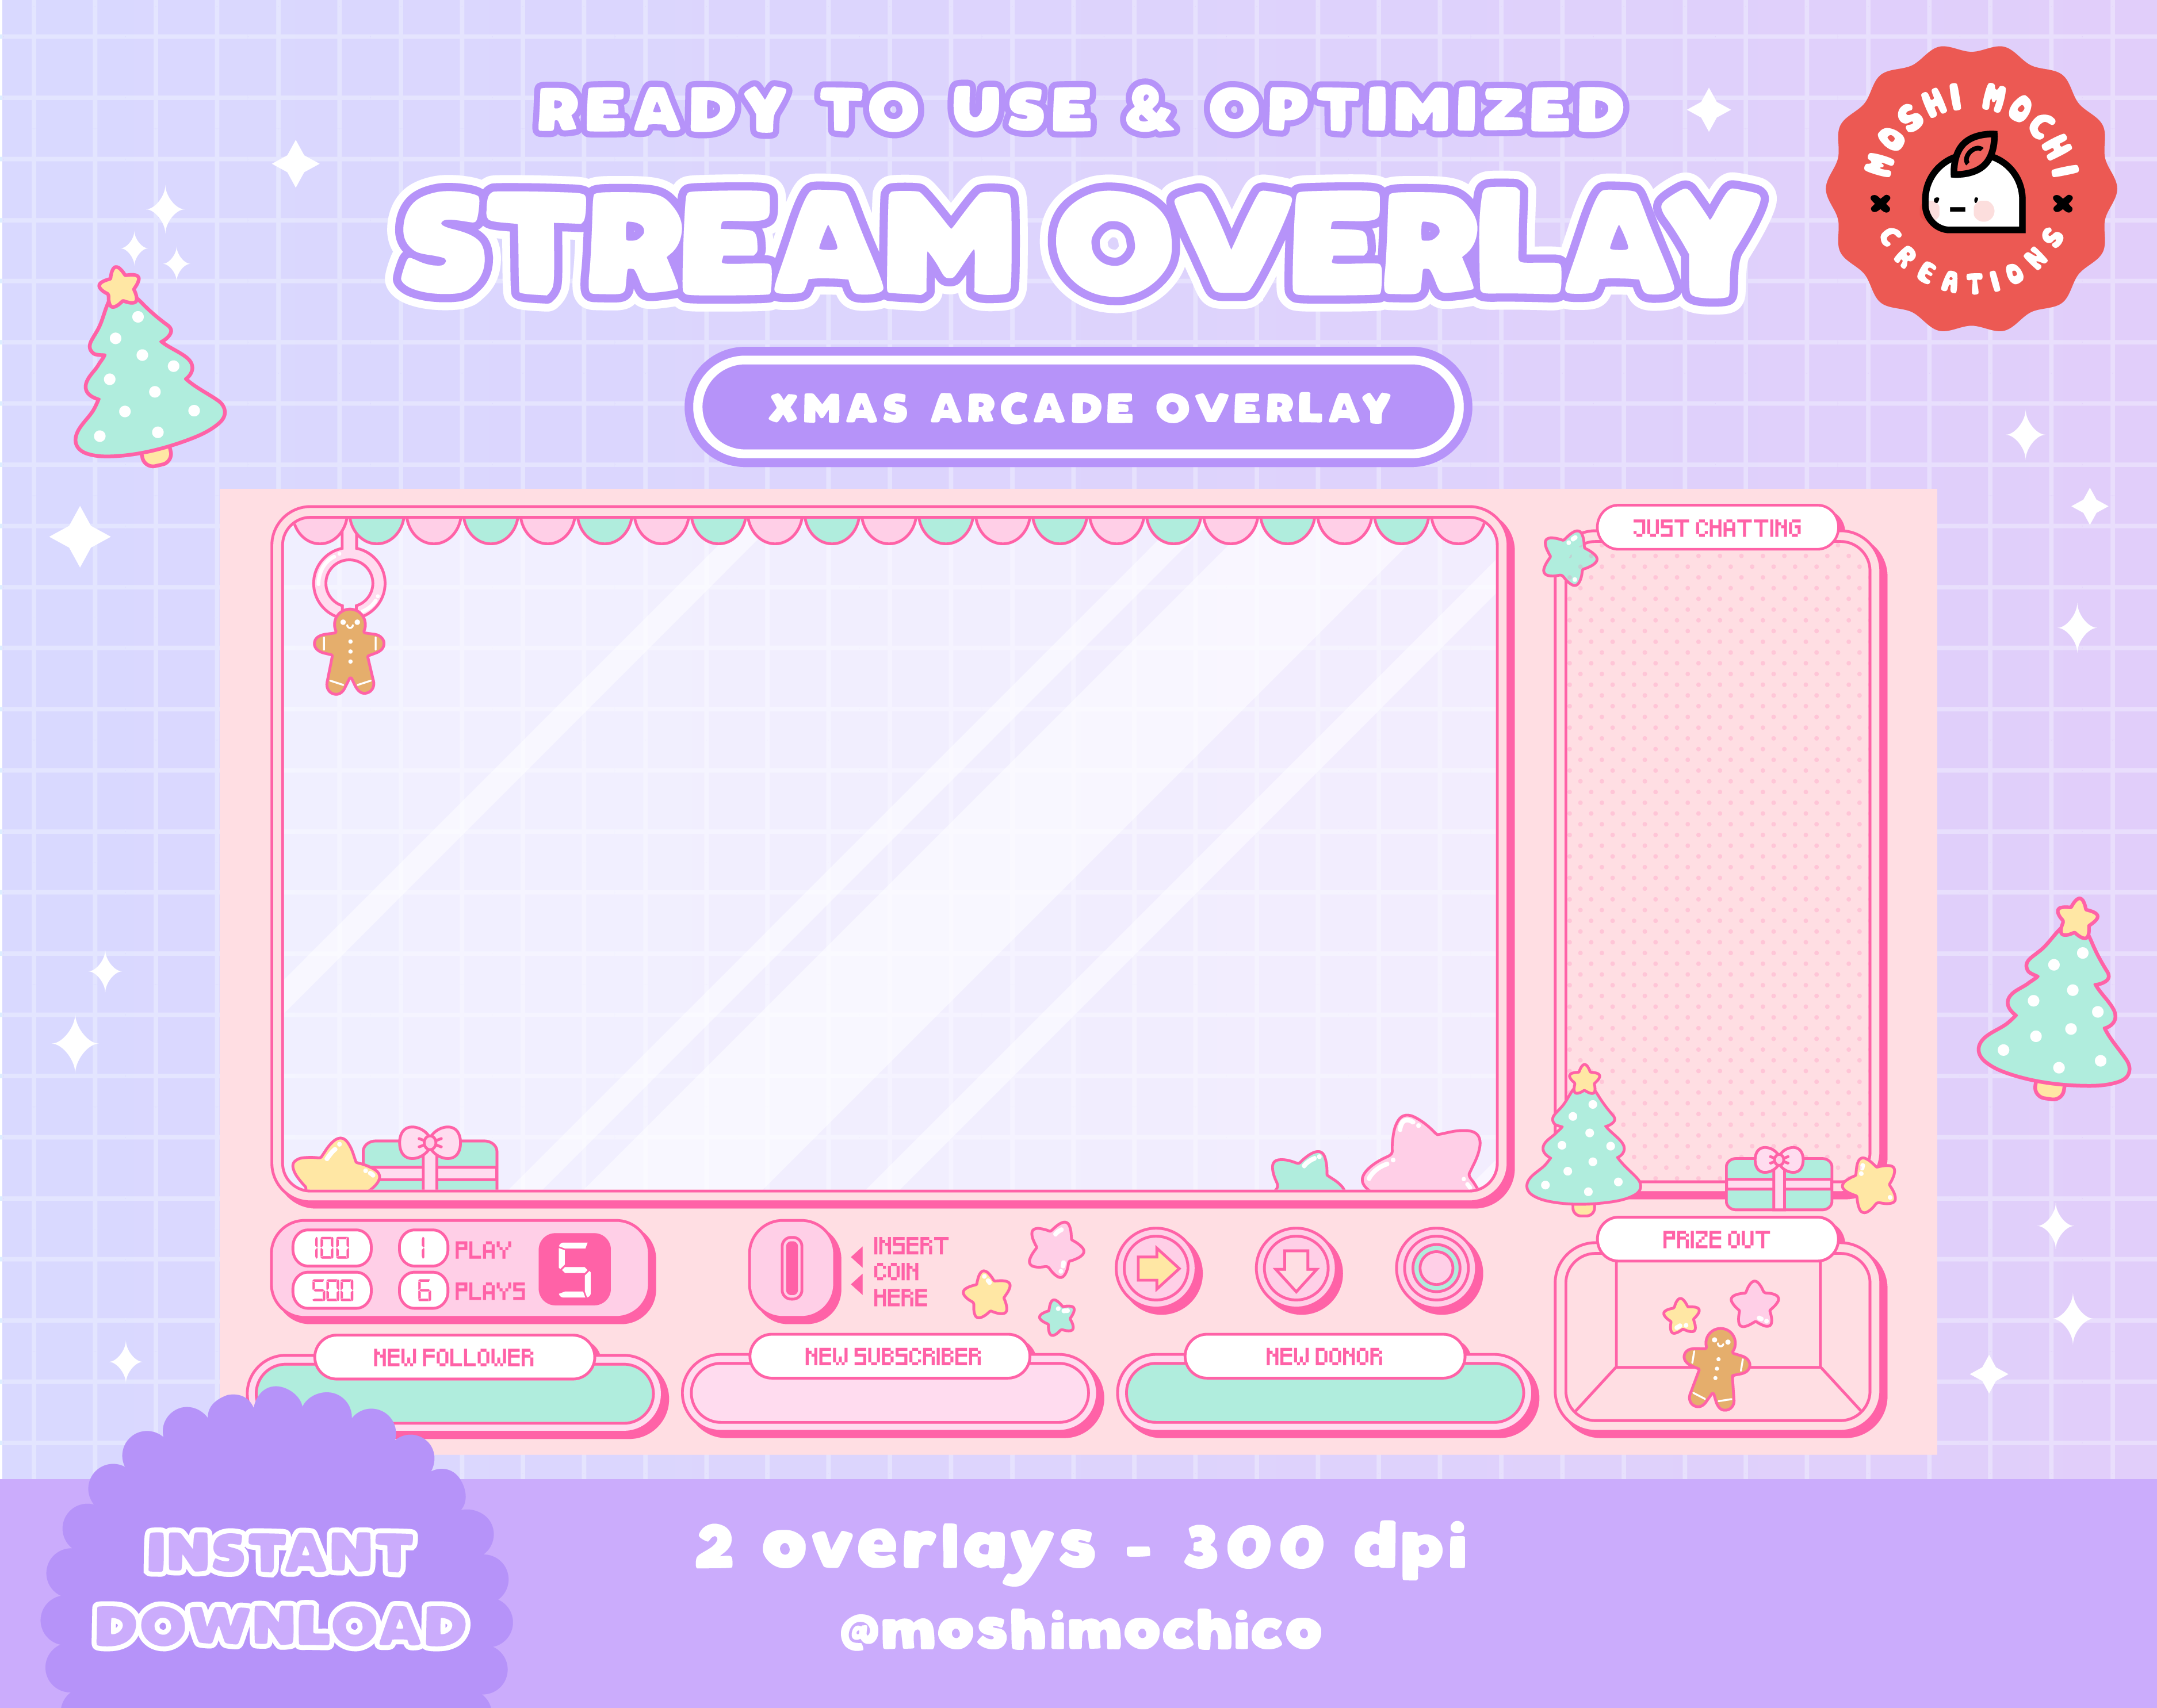 Twitch Stream Overlay Cute Christmas Xmas Arcade Crane Machine Version 2 Streamer Graphics Kawaii Streamer Pastel Japanese In 2021 Overlays Cute Overlays Crane Game